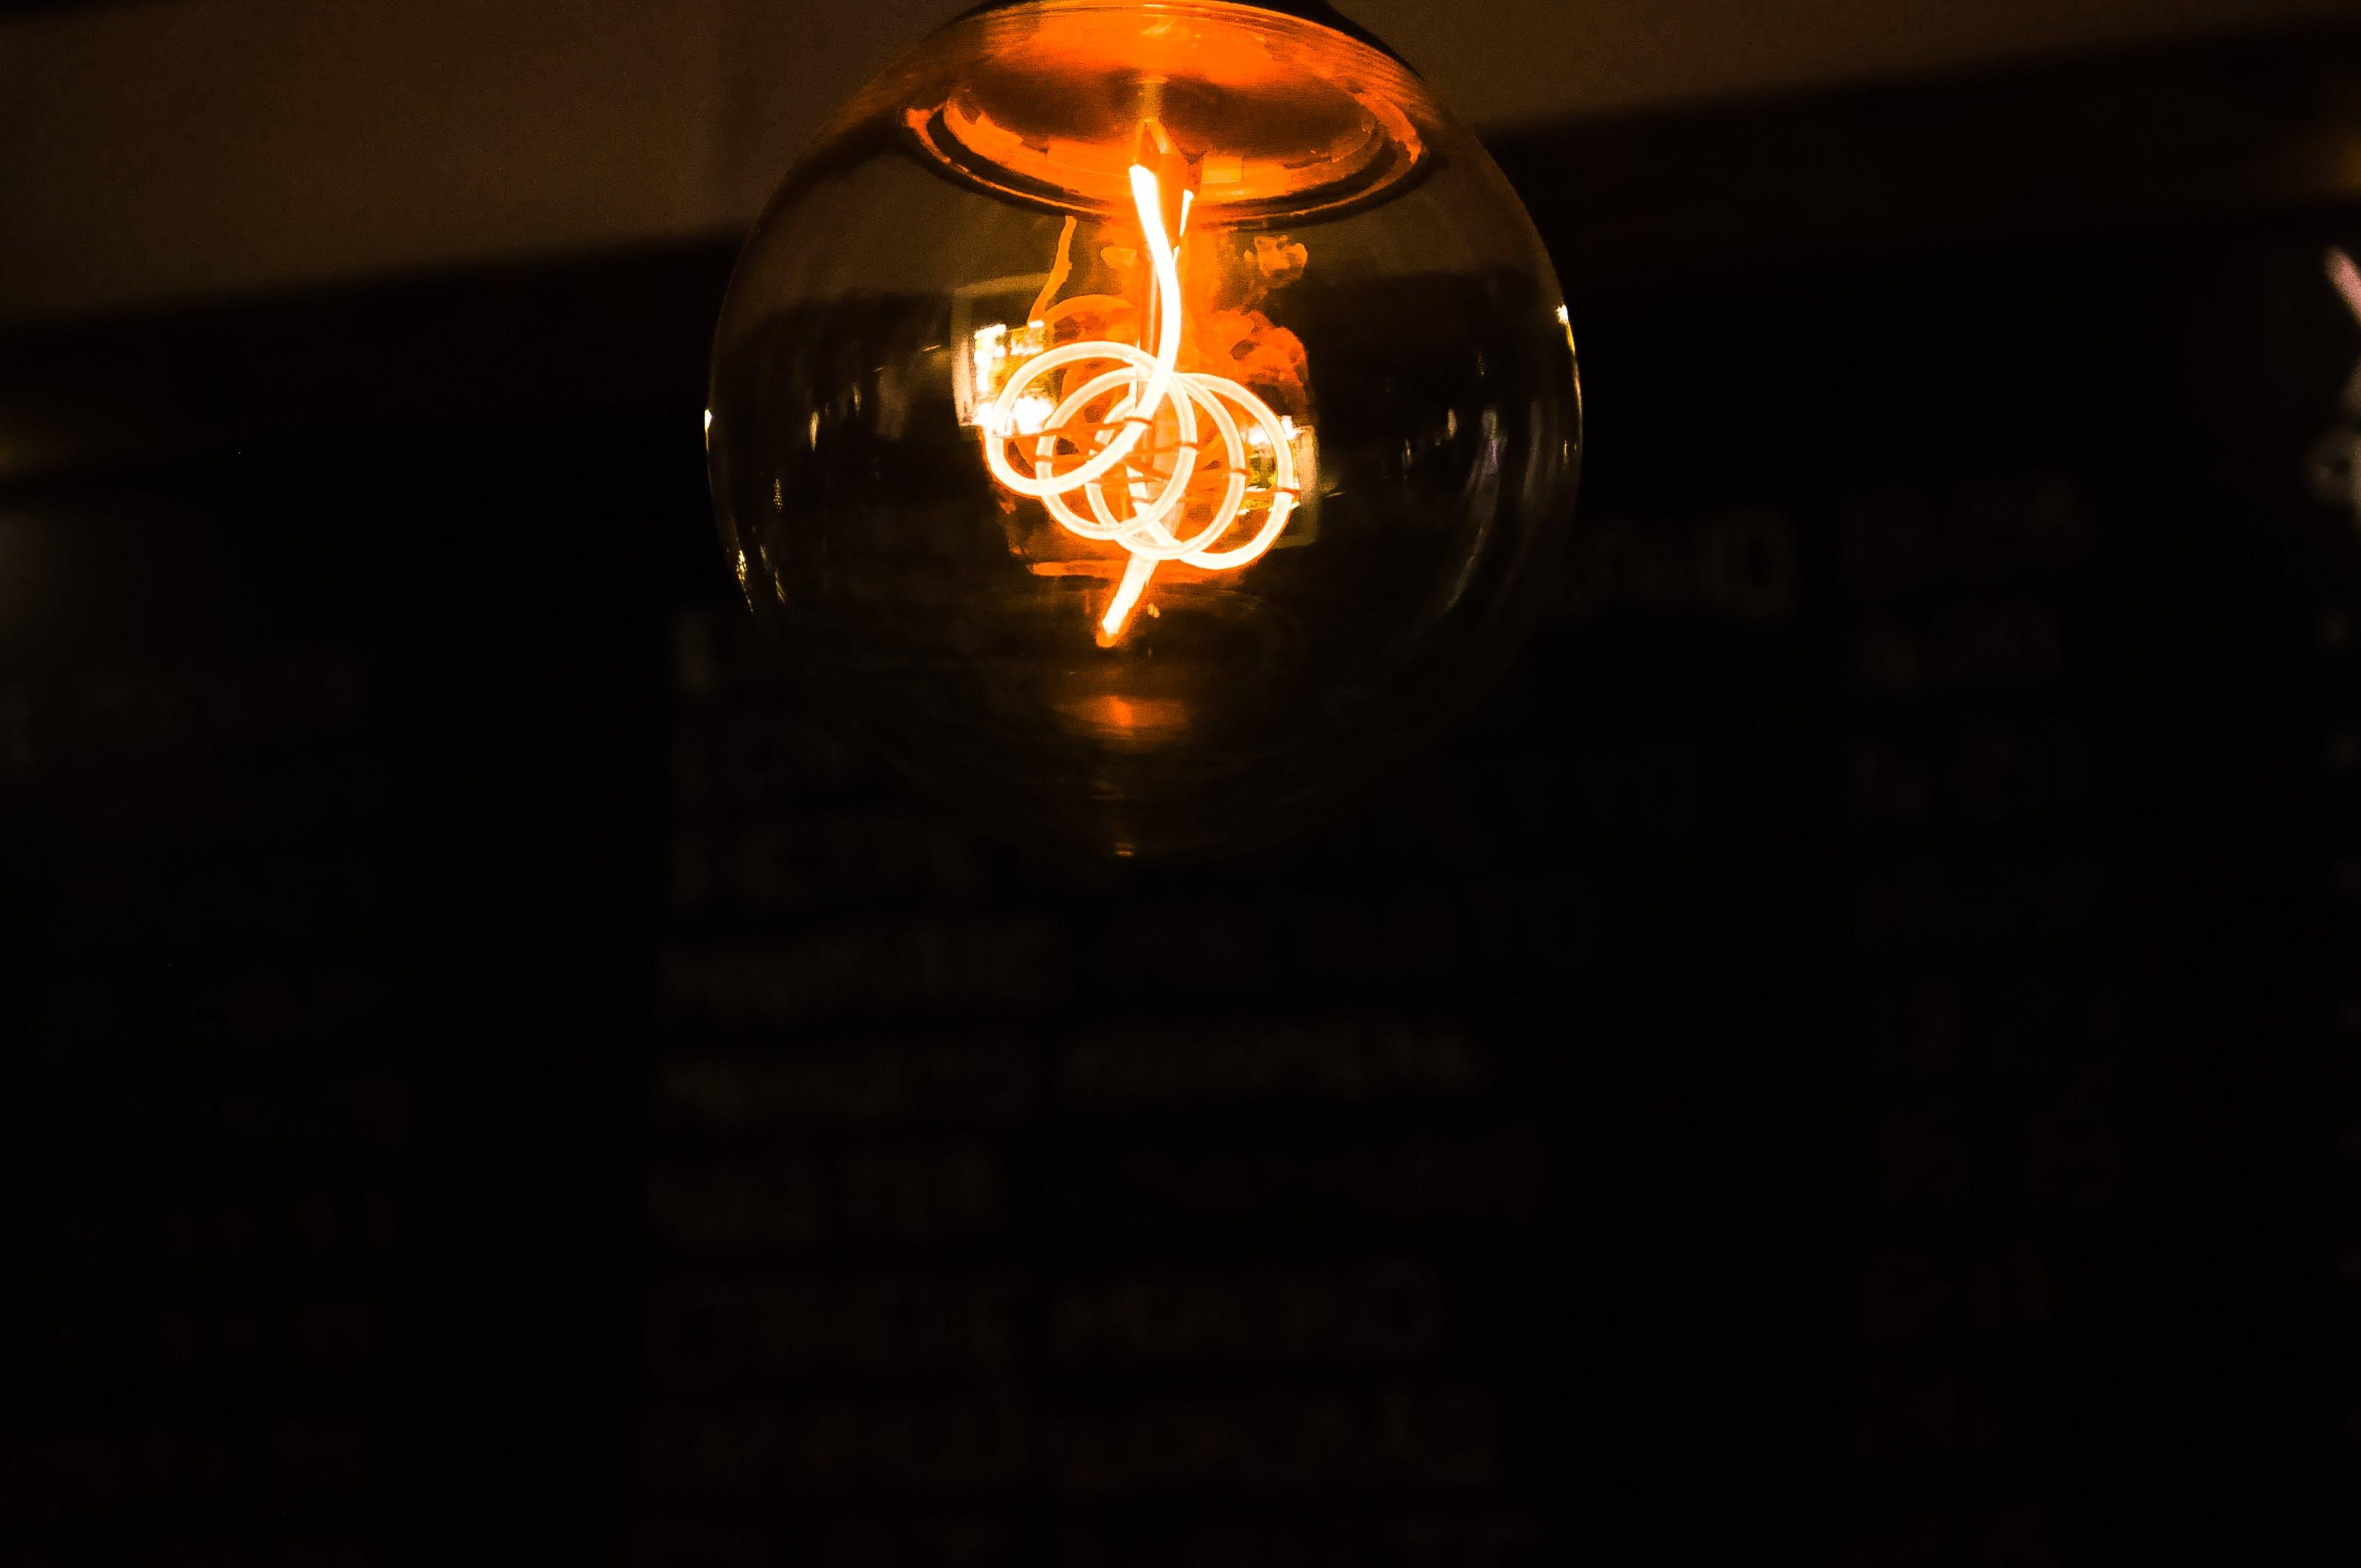 Showing Orange Coil Light